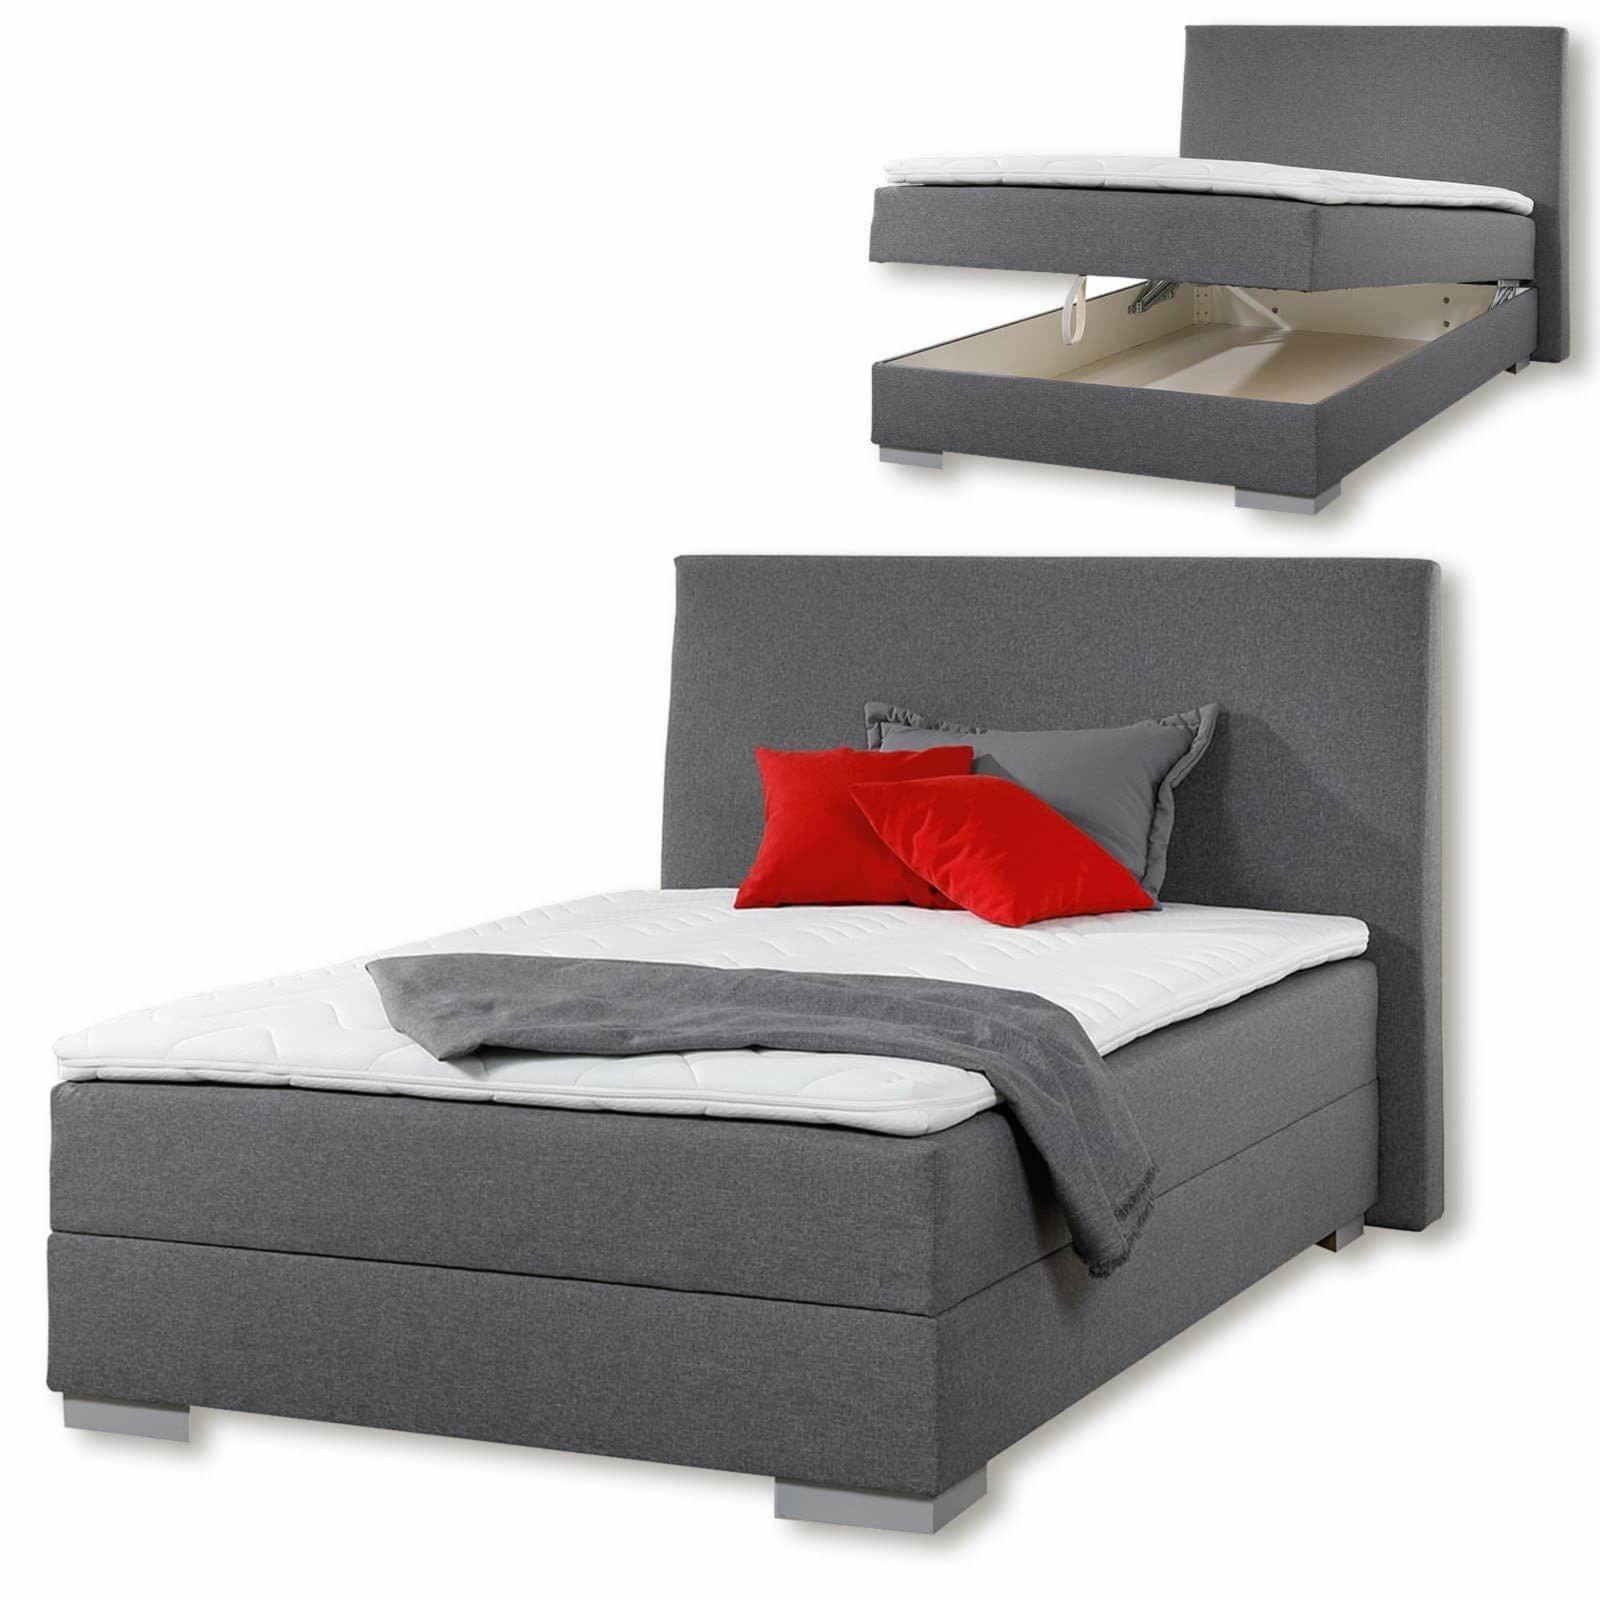 boxspringbett jumper grau h2 120x200 cm. Black Bedroom Furniture Sets. Home Design Ideas